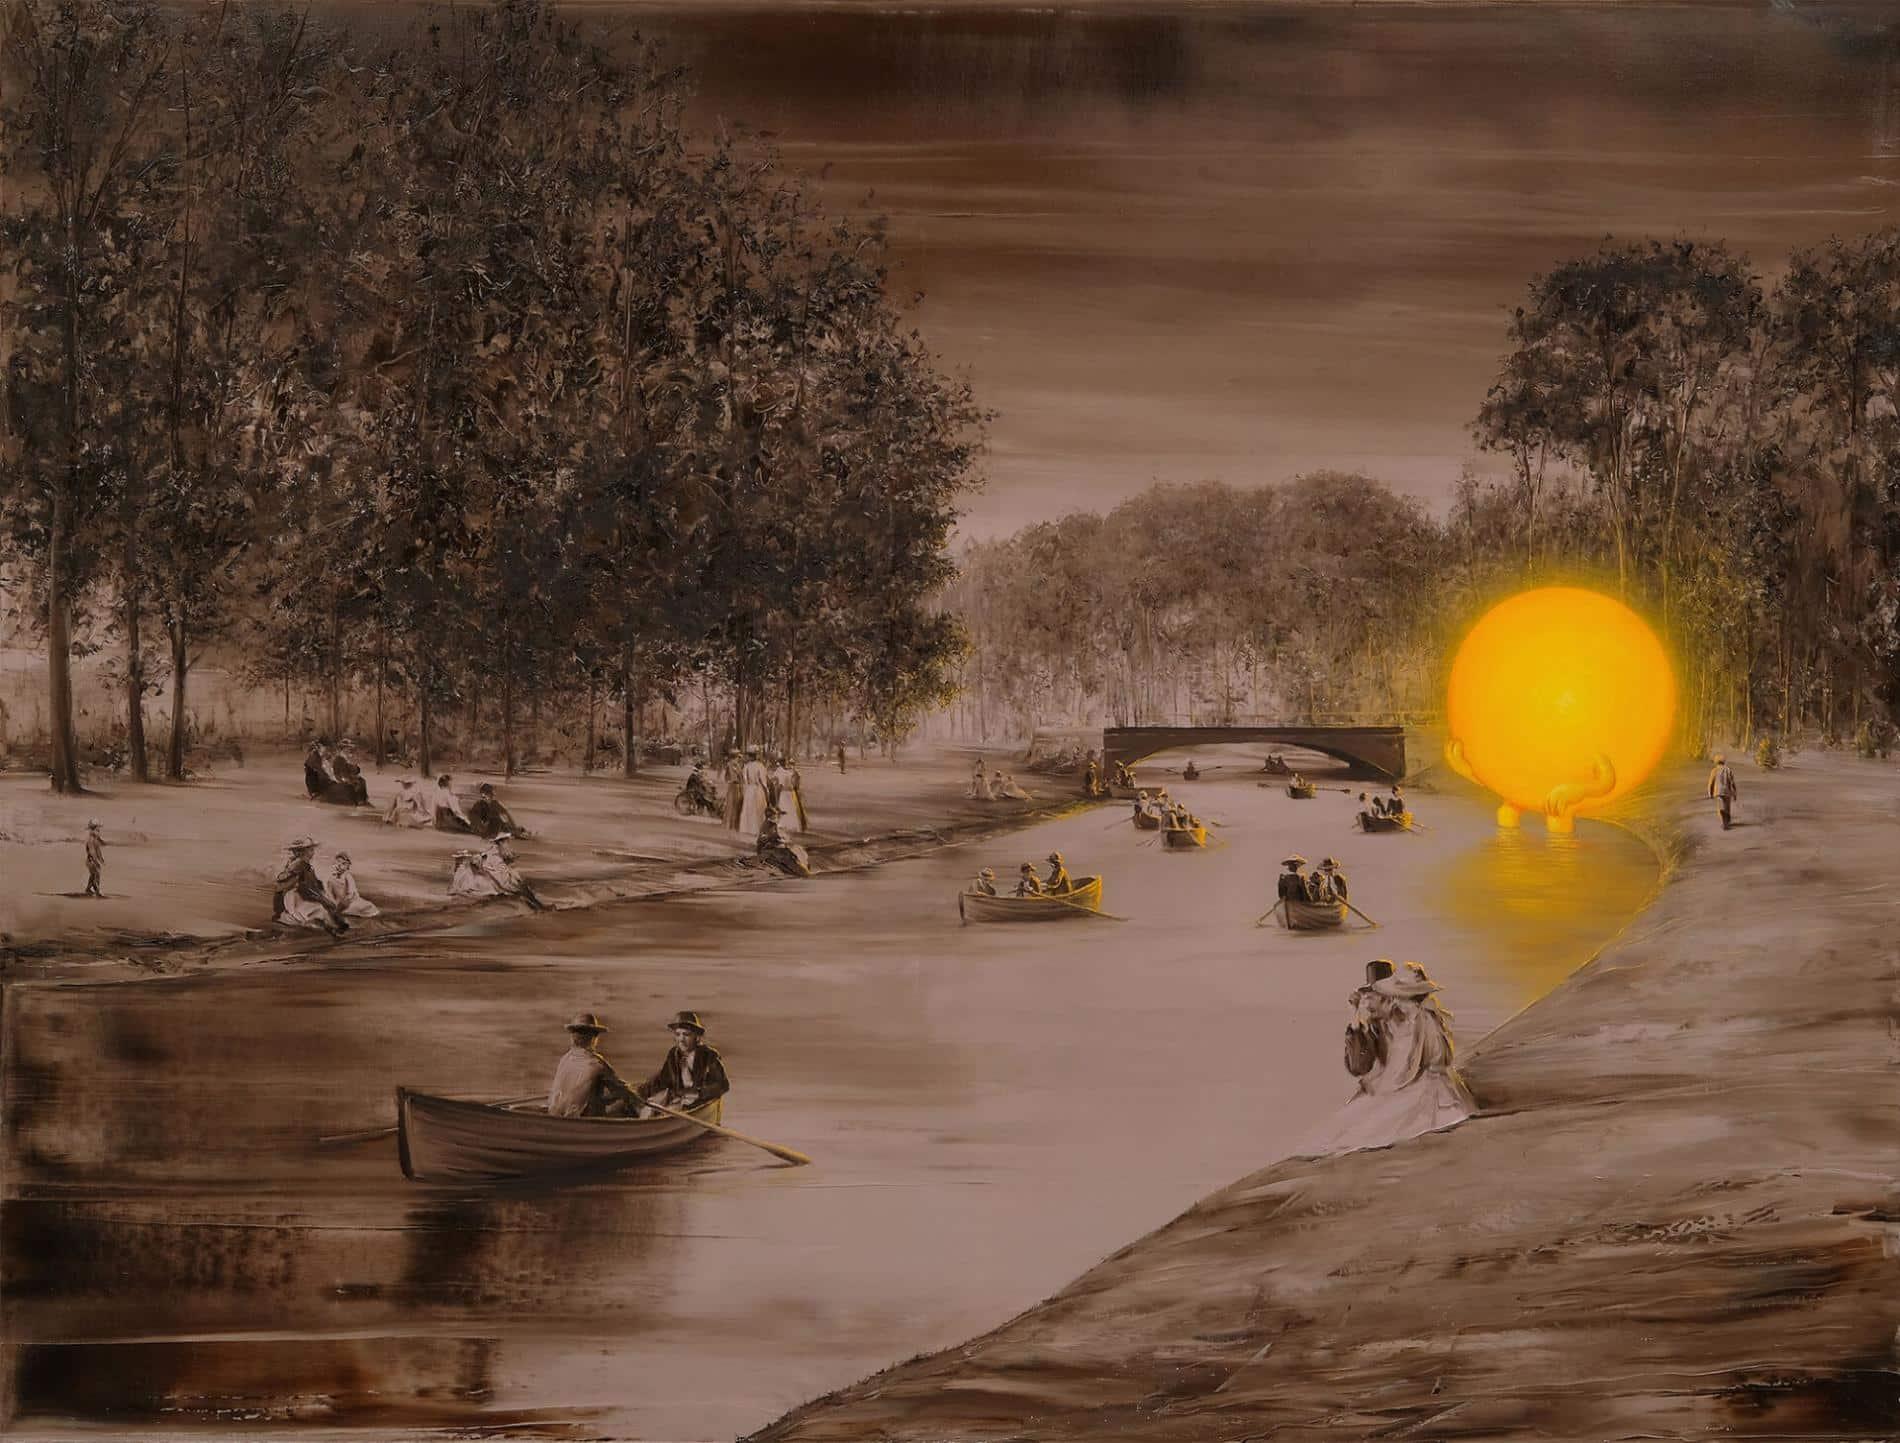 paco pomet sol rio